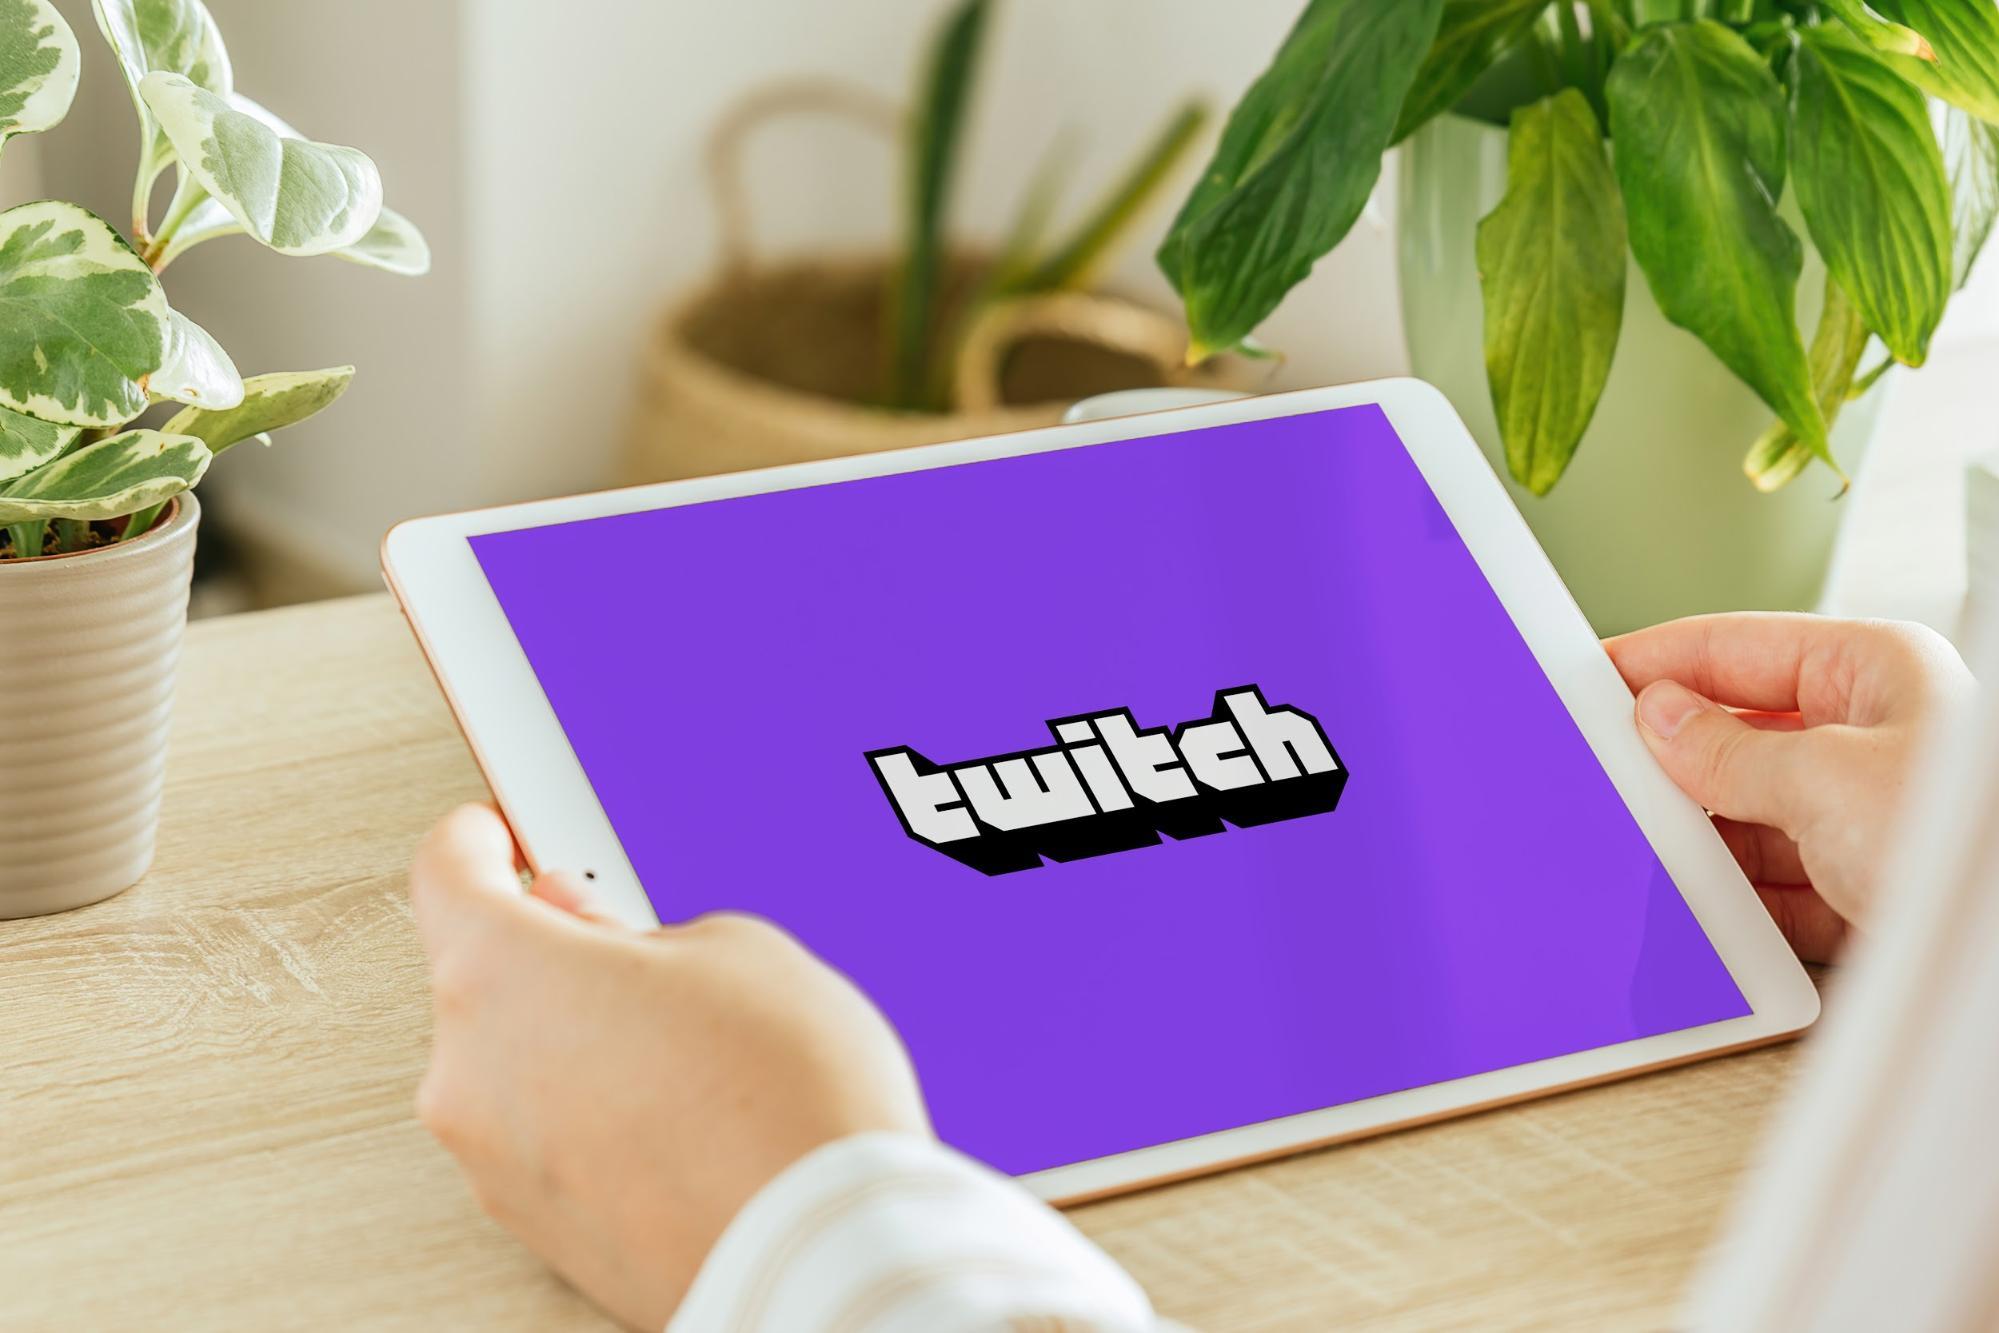 Twitch internship: Twitch logo shown on tablet